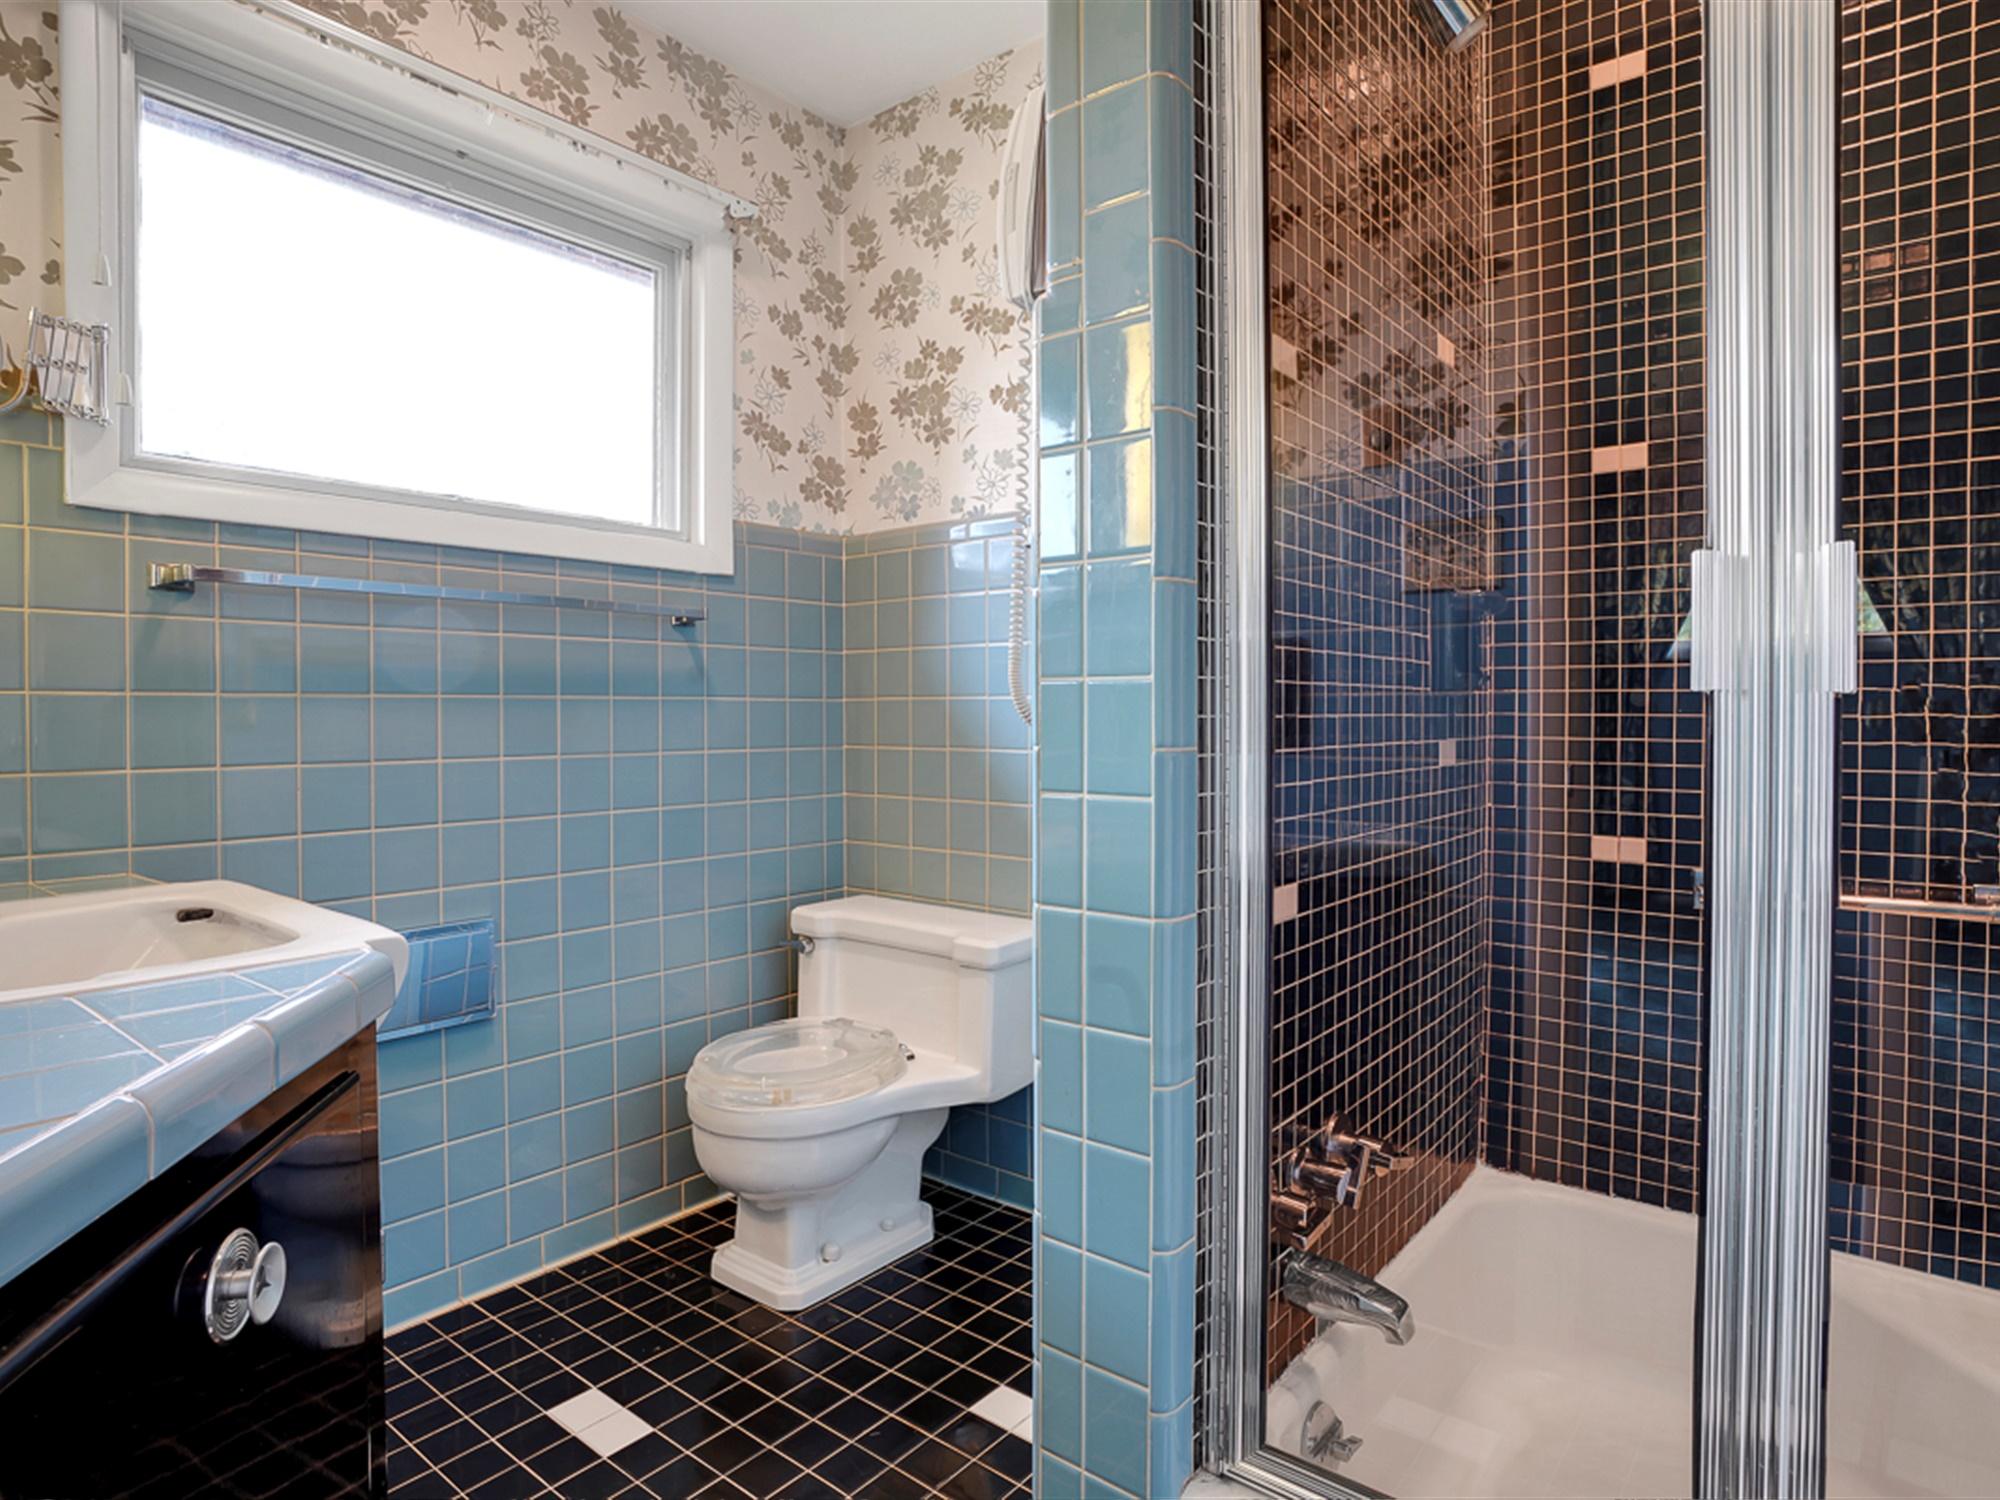 964 Reber St - Princess Suite bathroom